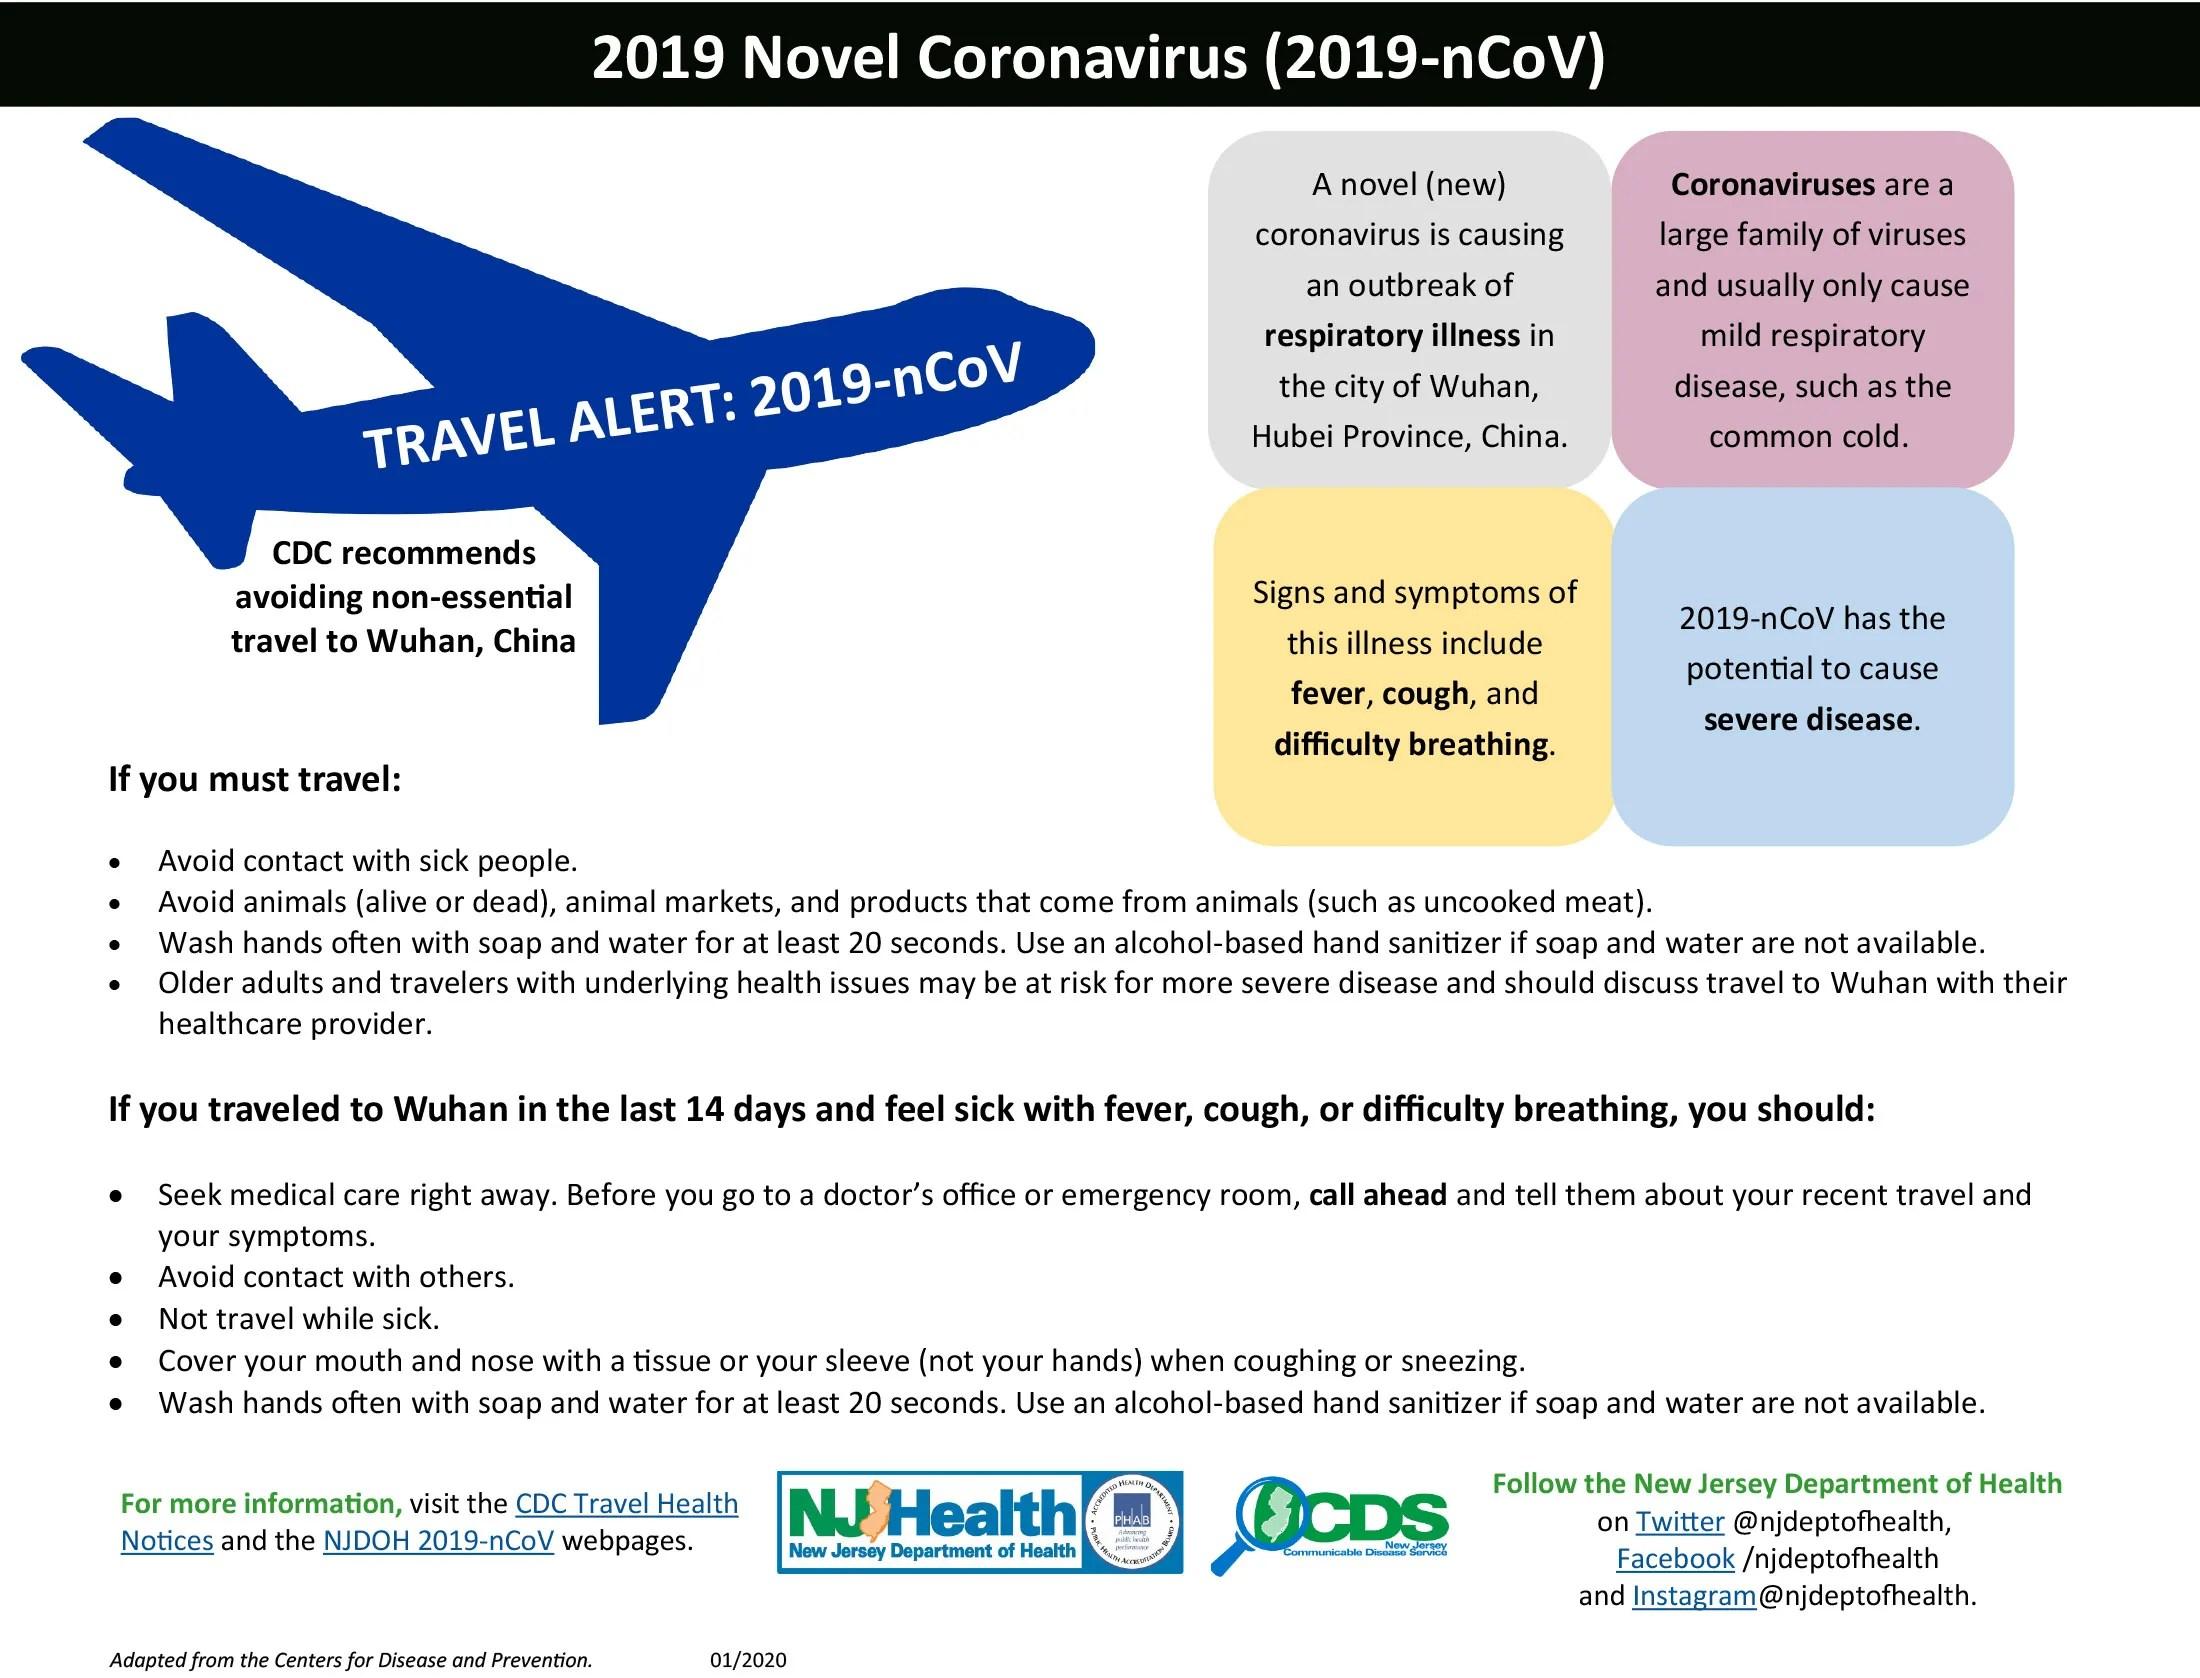 New York Clears Seven Of 10 Suspected Coronavirus Cases